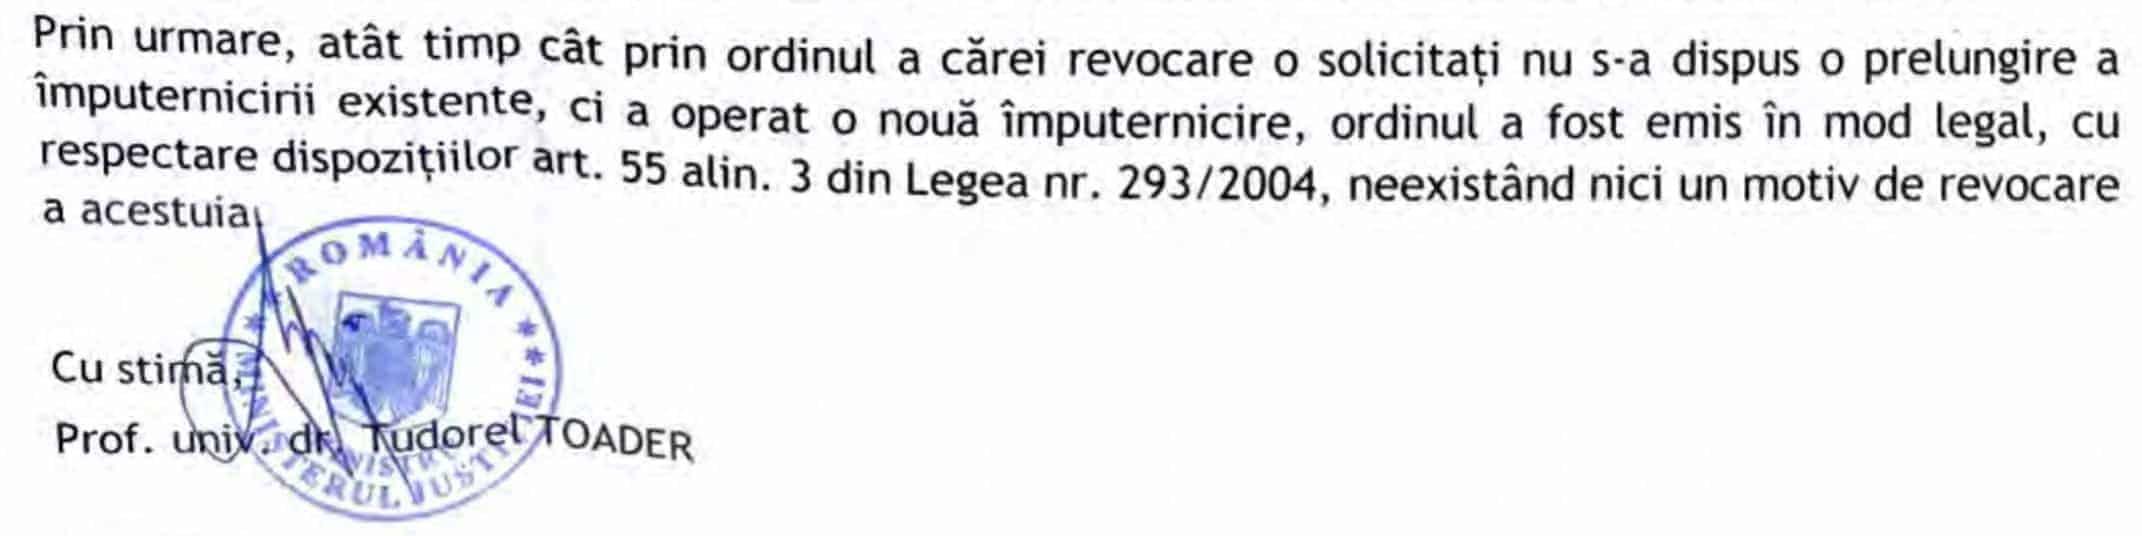 Raspuns Ministerul Justitiei - imputernicire ilegala Marian Dobrica